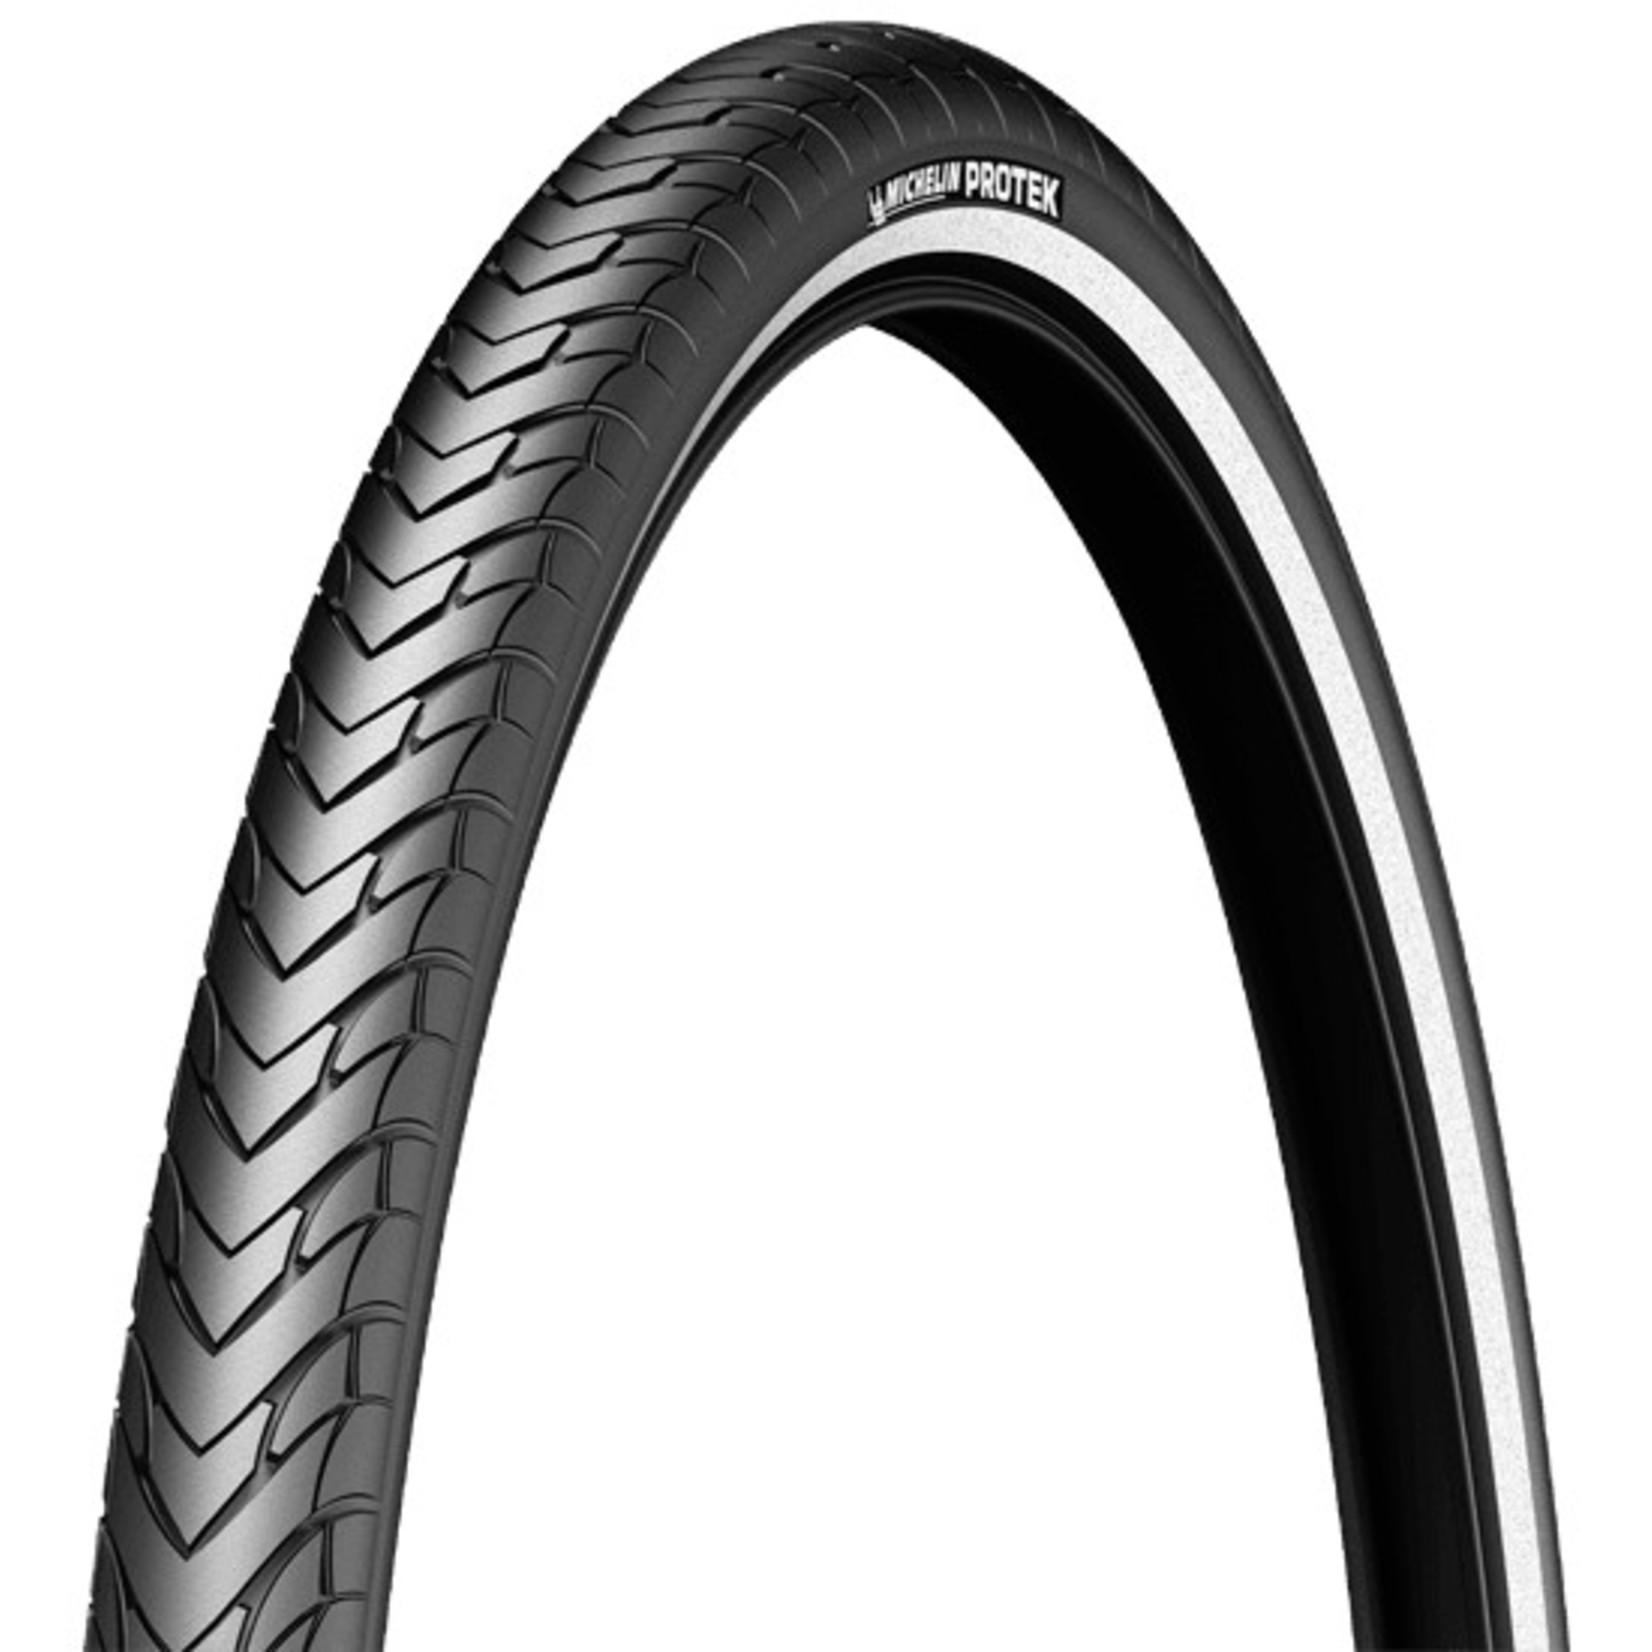 Michelin Protek 700